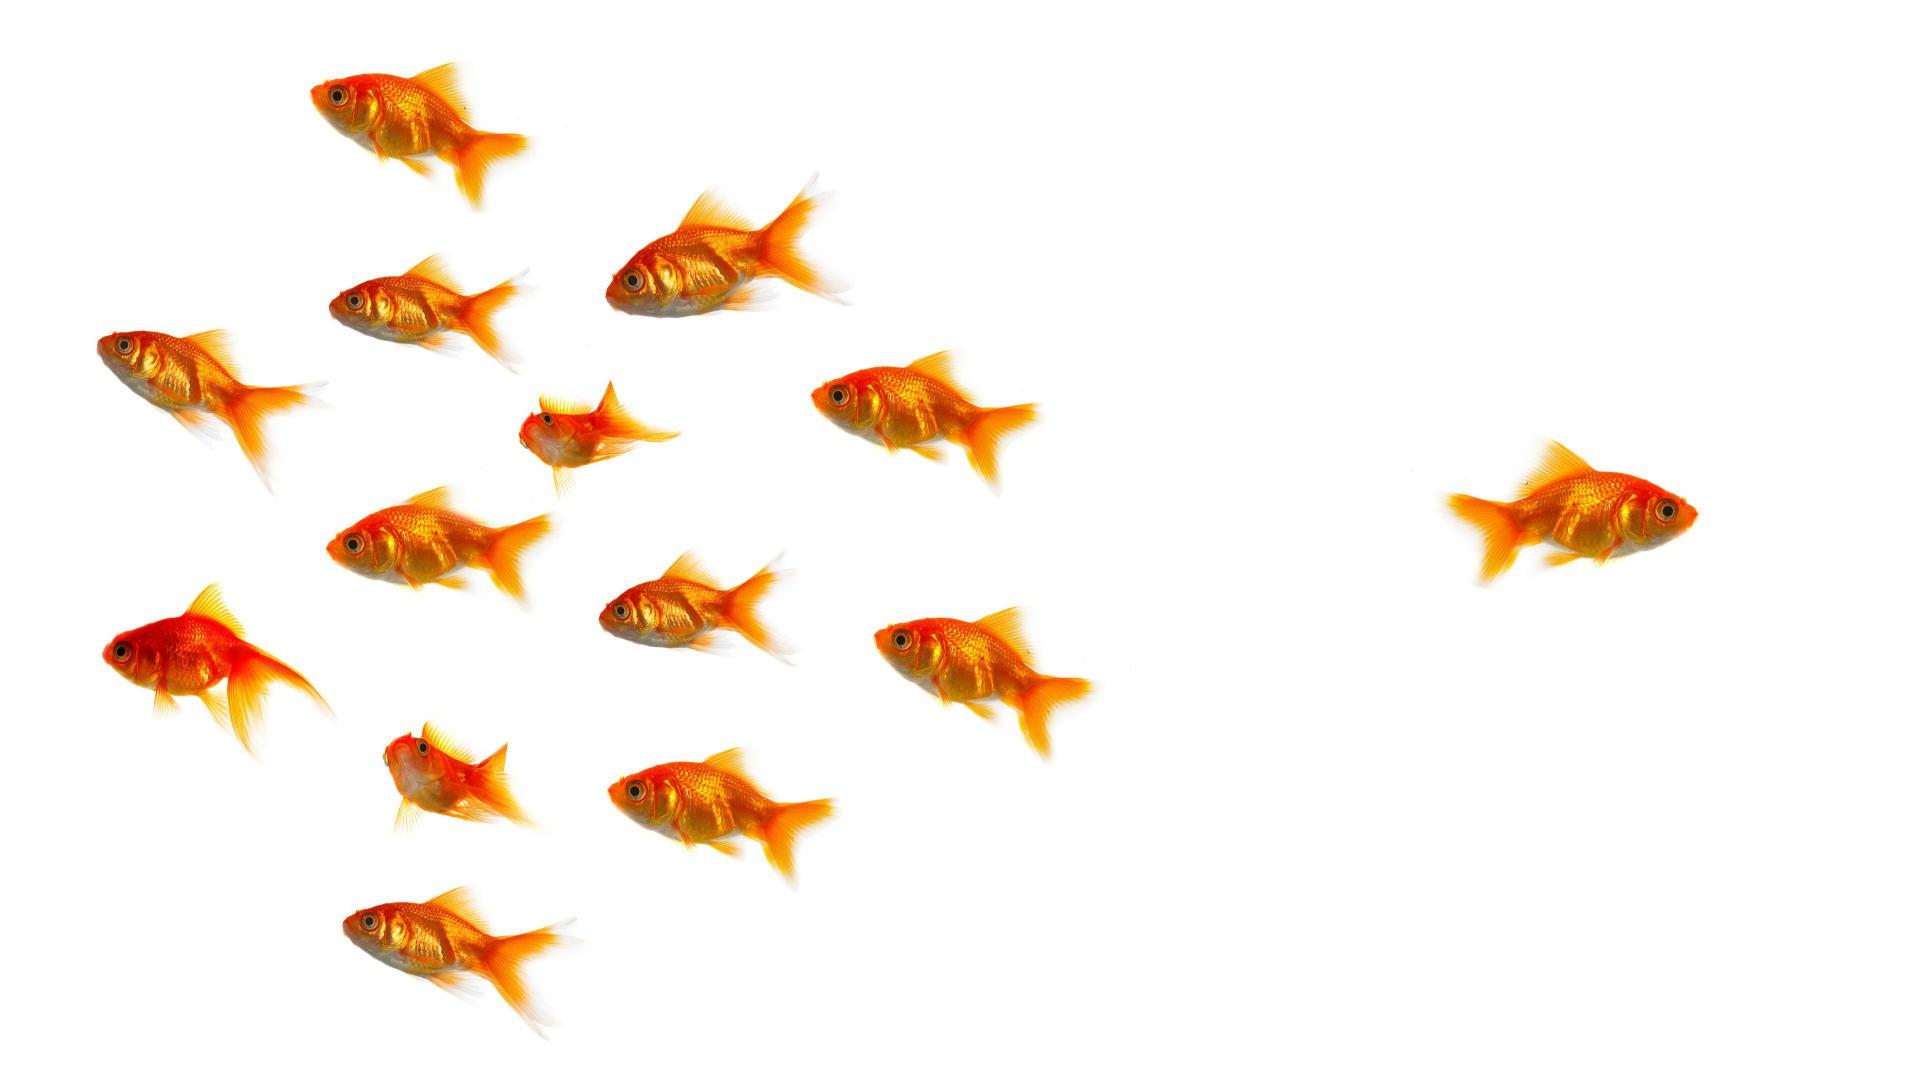 Goldfish Different Wallpaper 1920x1080 Goldfish Different 1920x1080